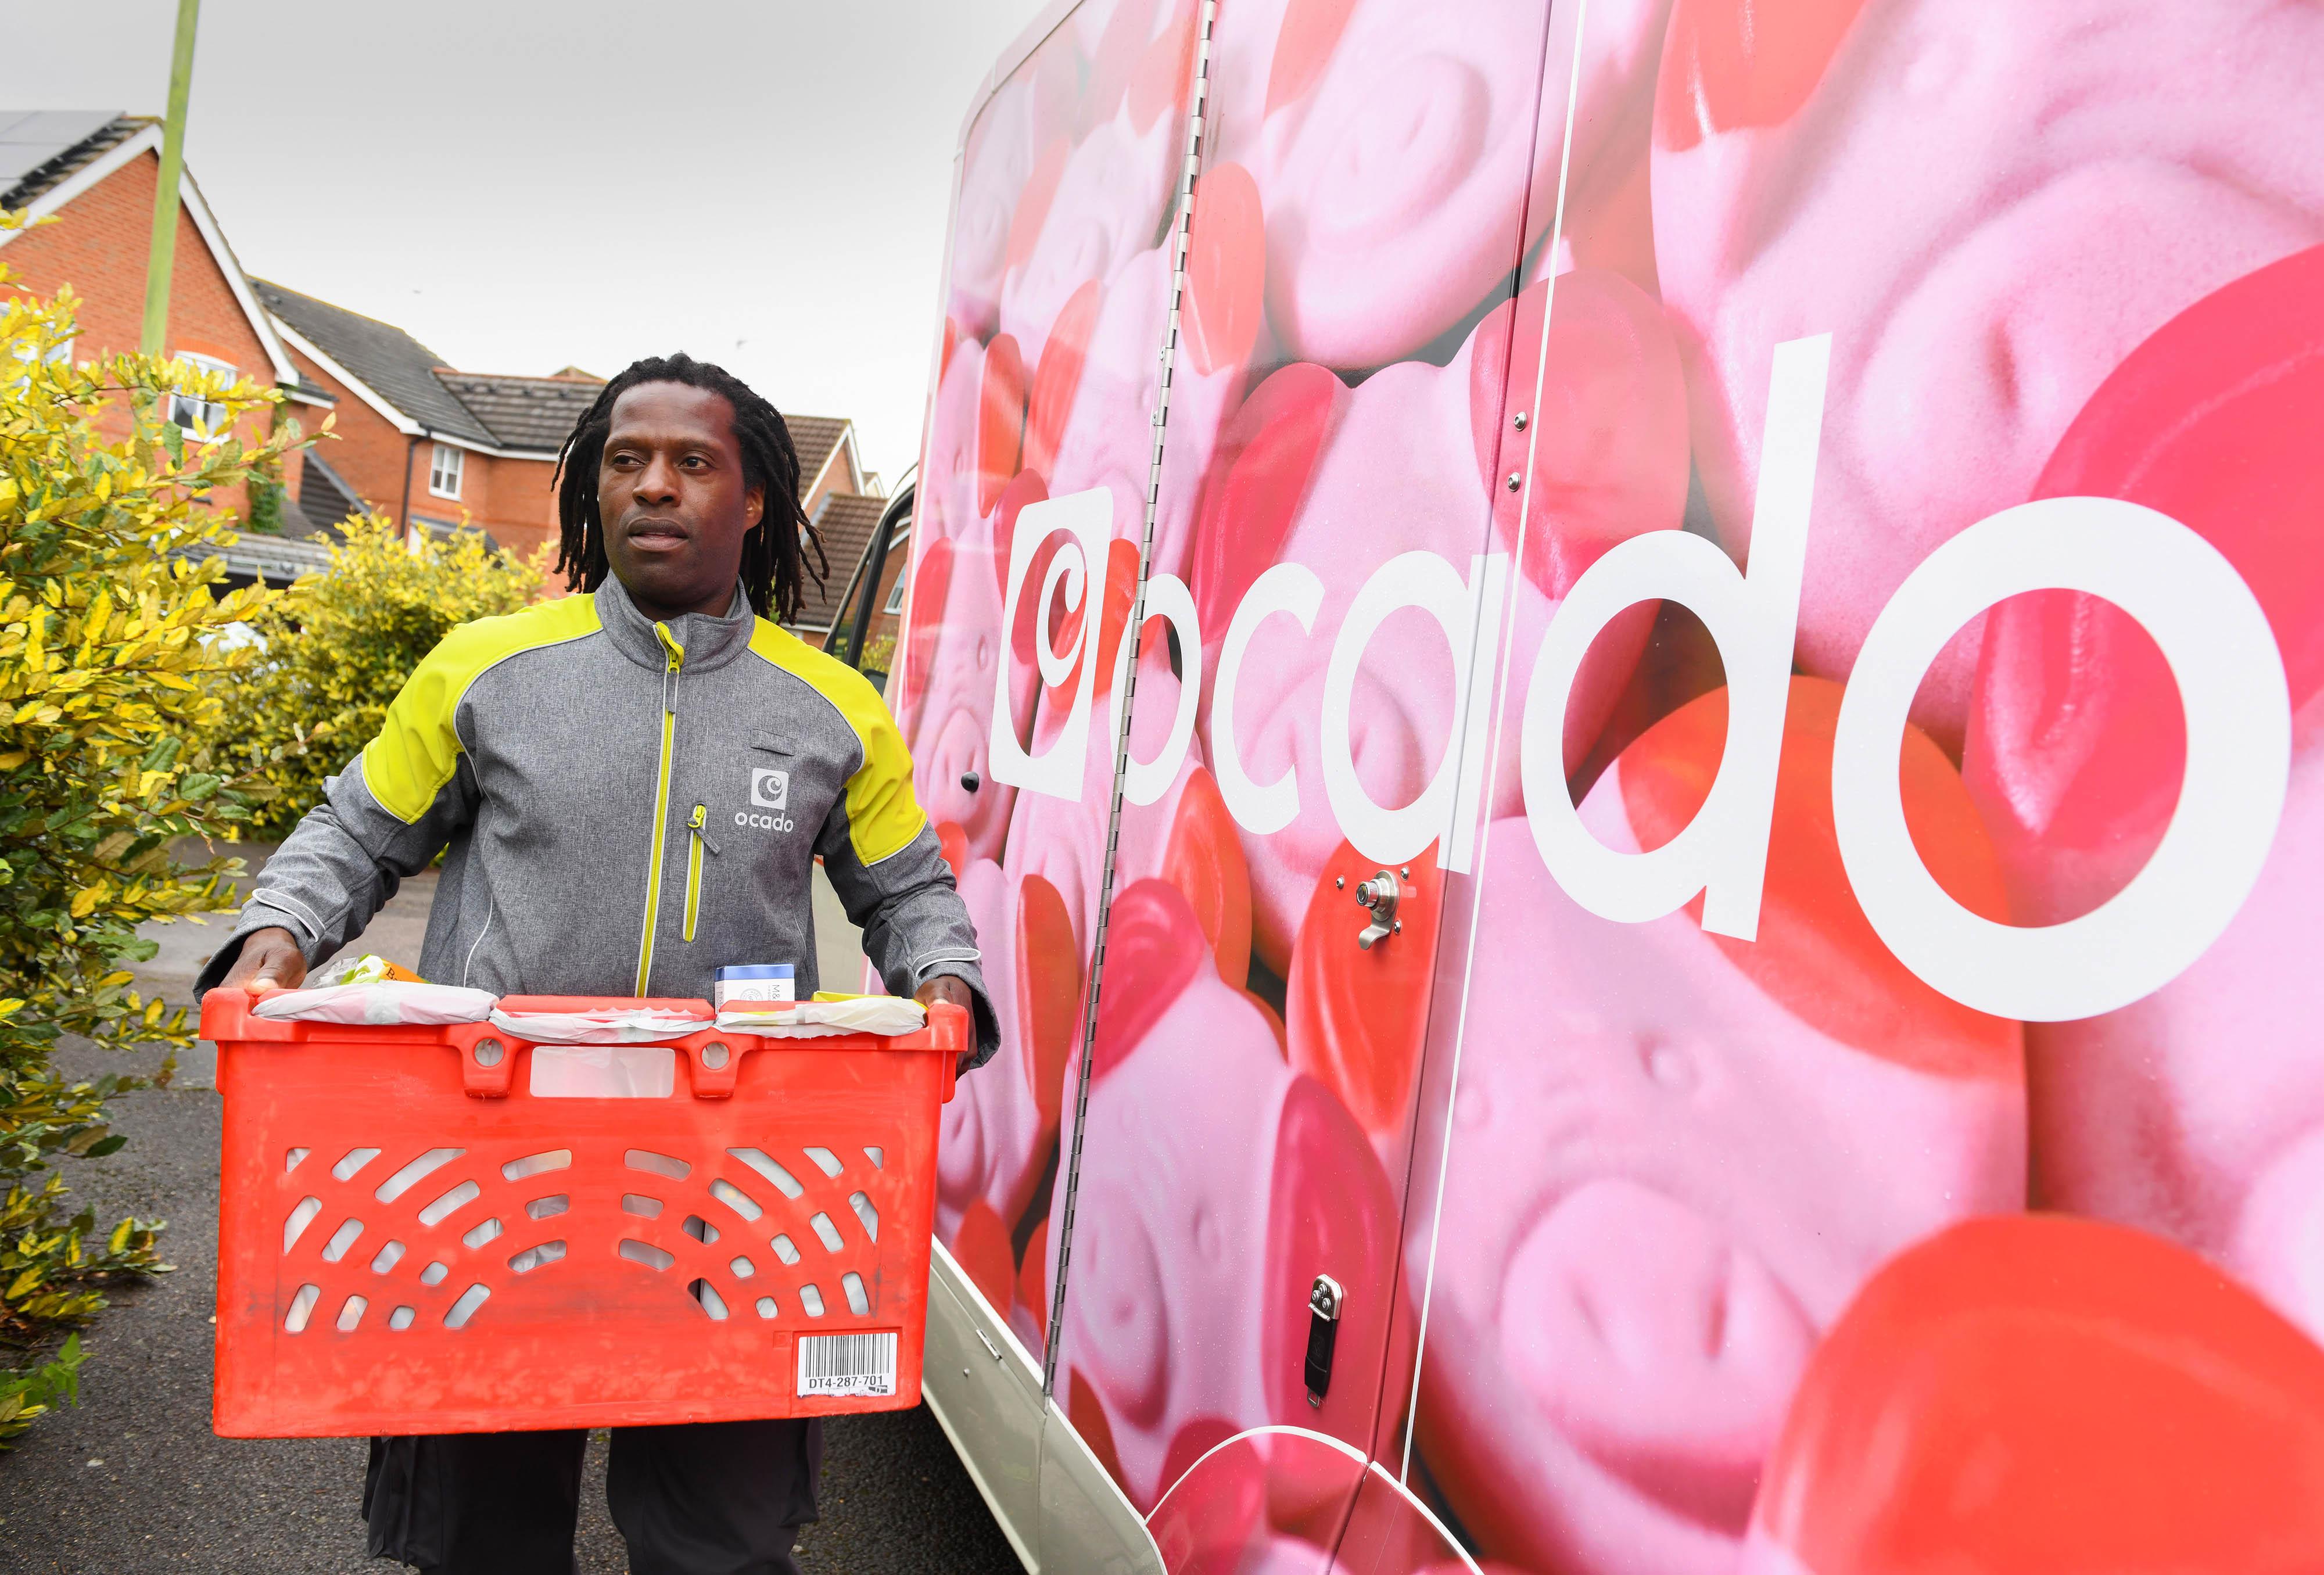 Ocado: brand has created 10 Percy Pig vans